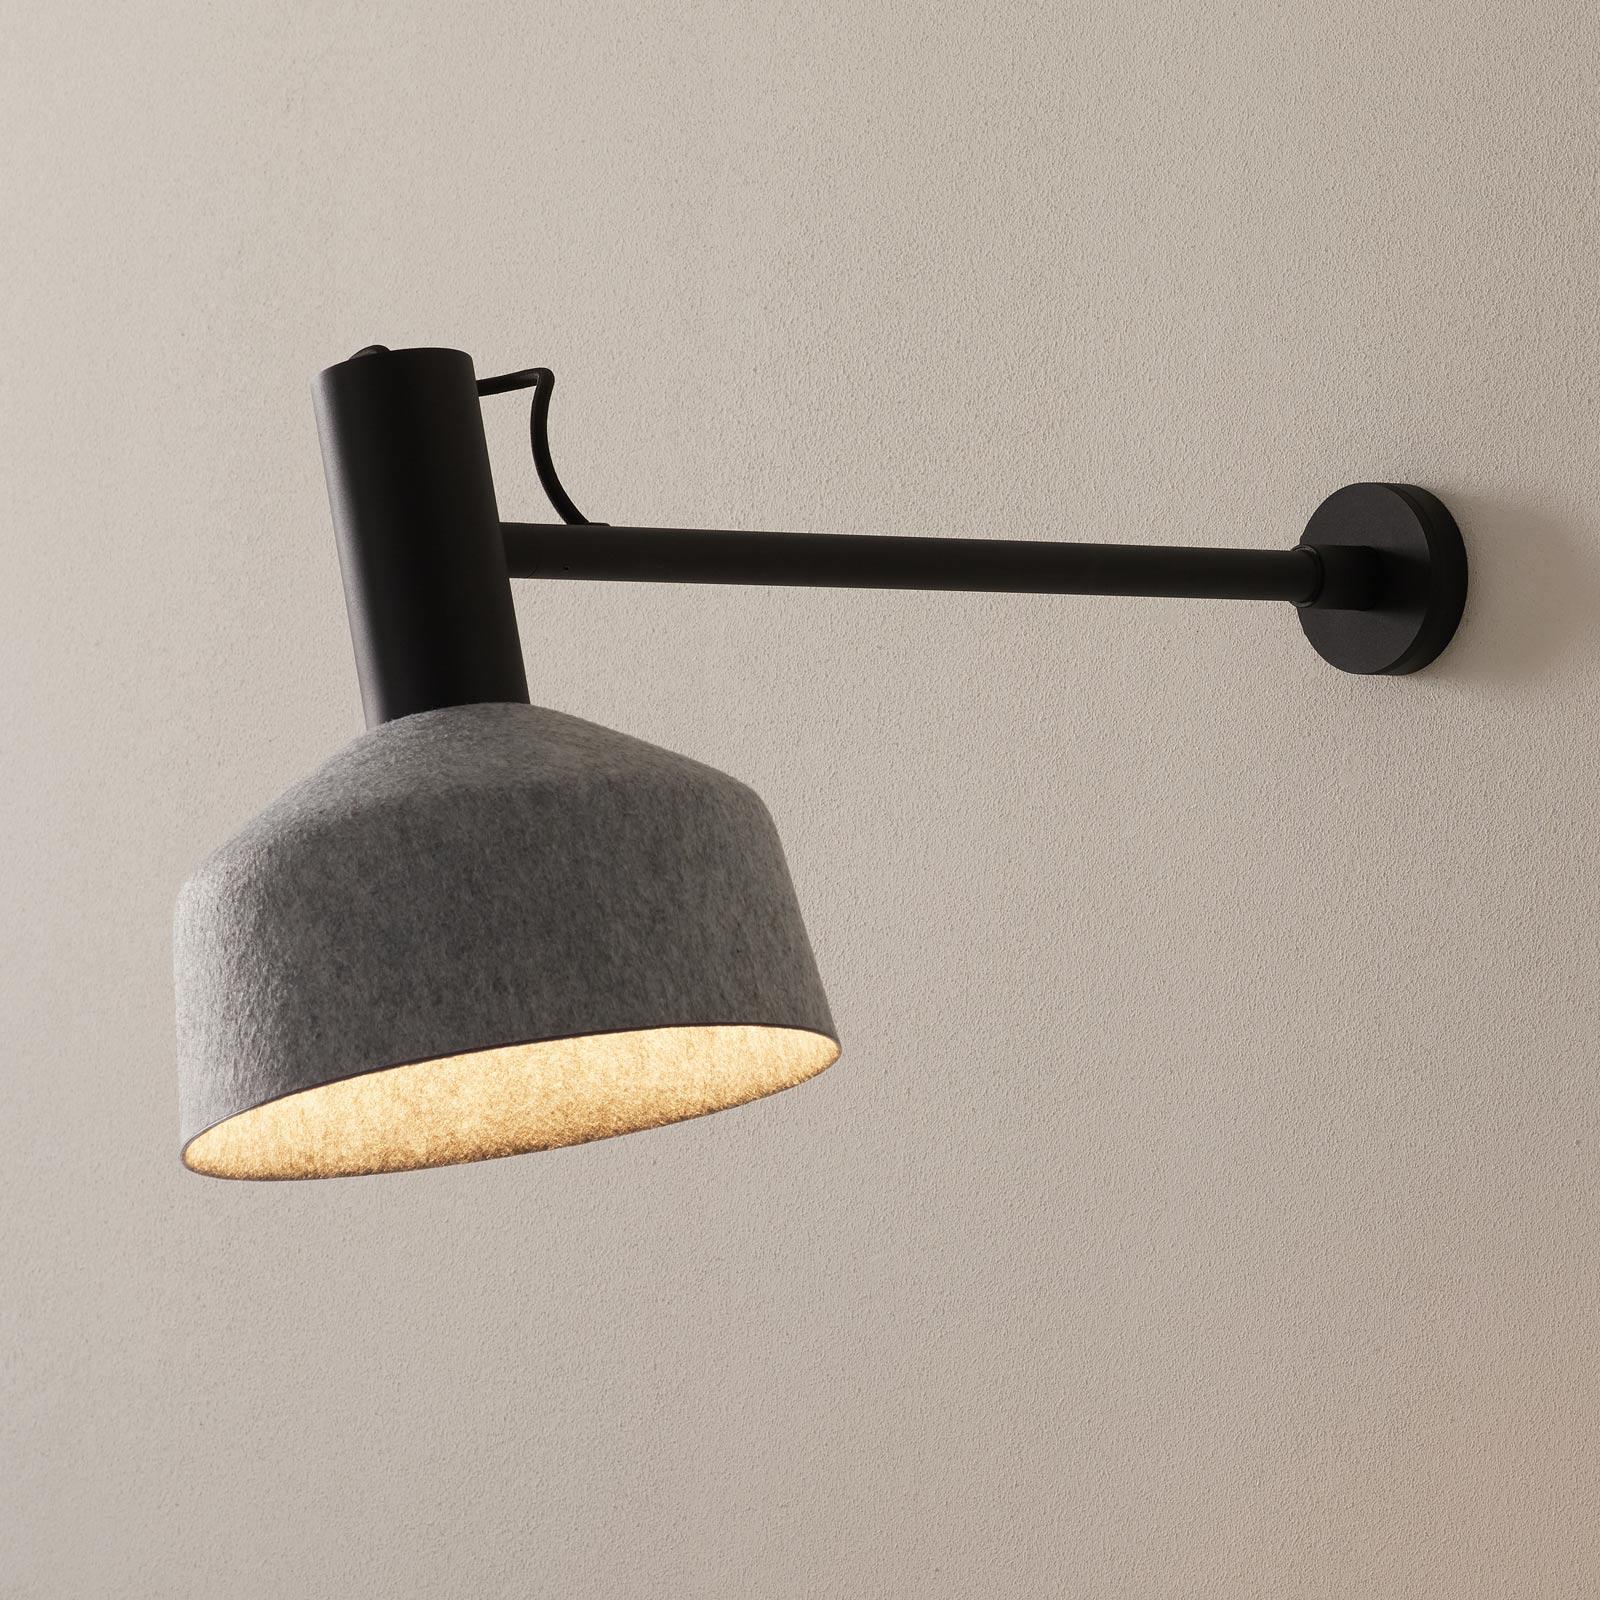 WEVER & DUCRÉ Roomor væglampe 2.0 25 cm sort-grå